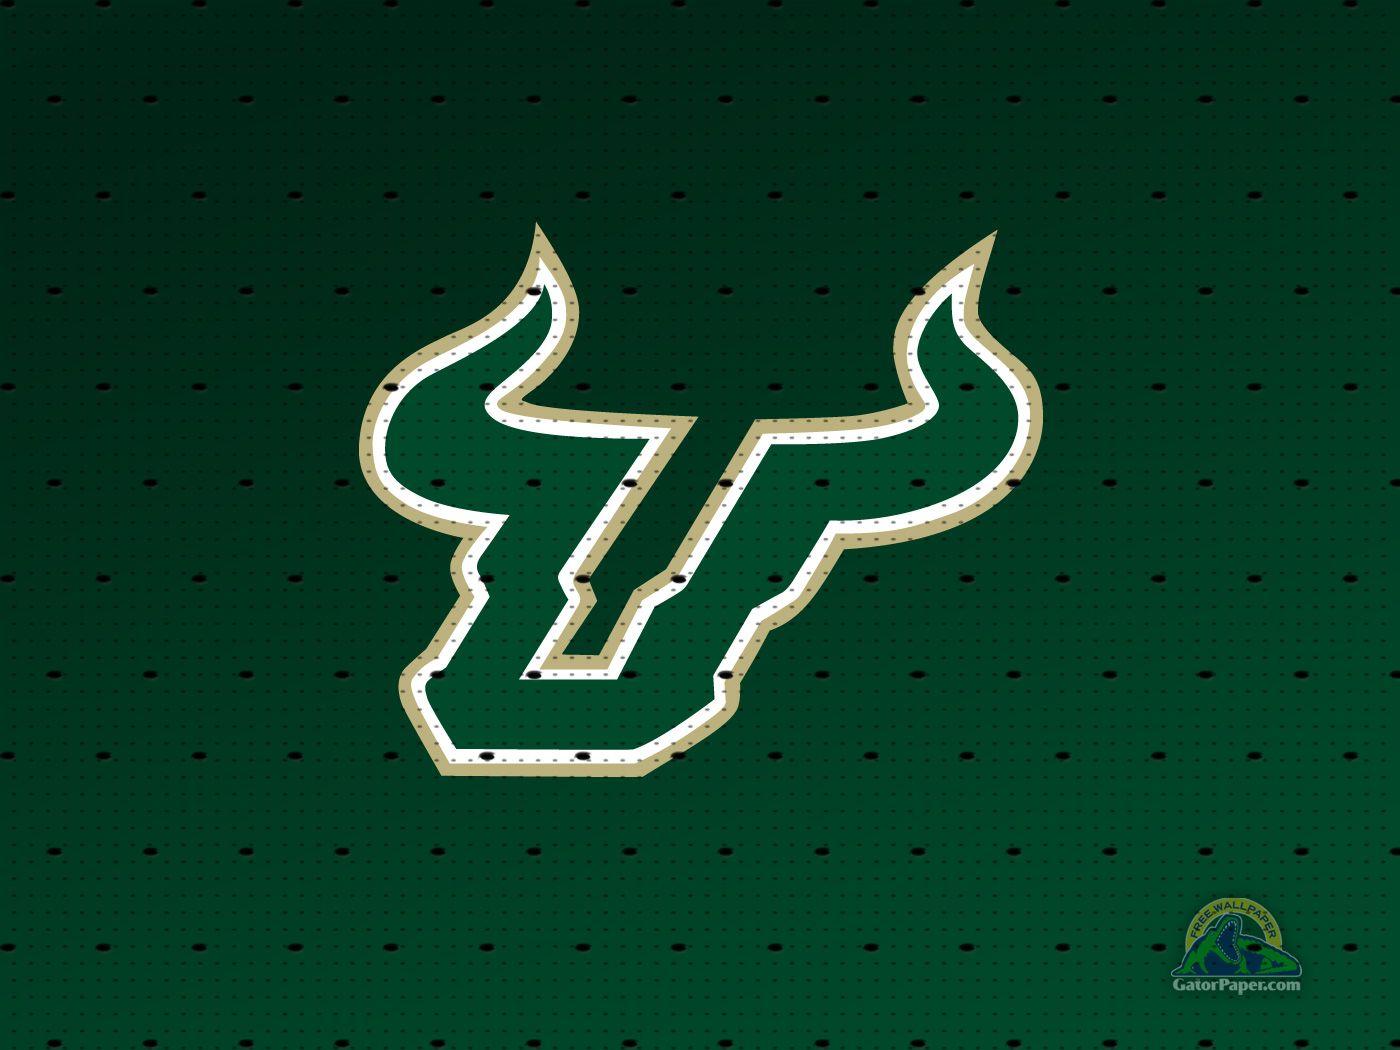 Usffabric2 1400 Jpg 1 400 1 050 Pixels University Of South Florida Florida Wallpaper South Florida Bulls